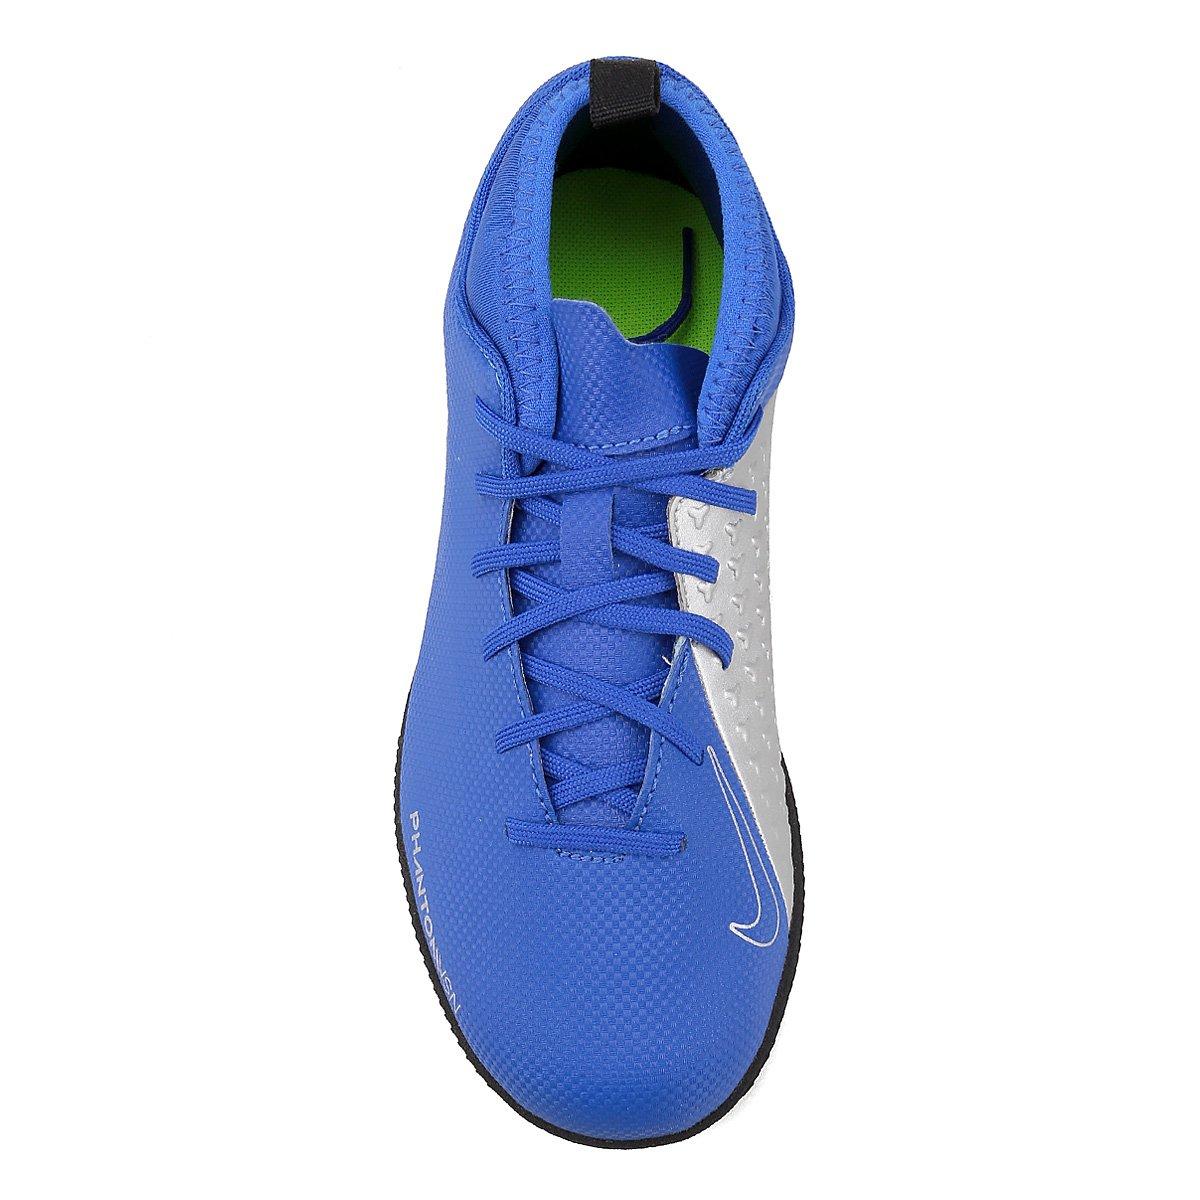 Chuteira Futsal Infantil Nike Phantom Vison Club DF IC - Azul ... 5c1d19e8c29ea